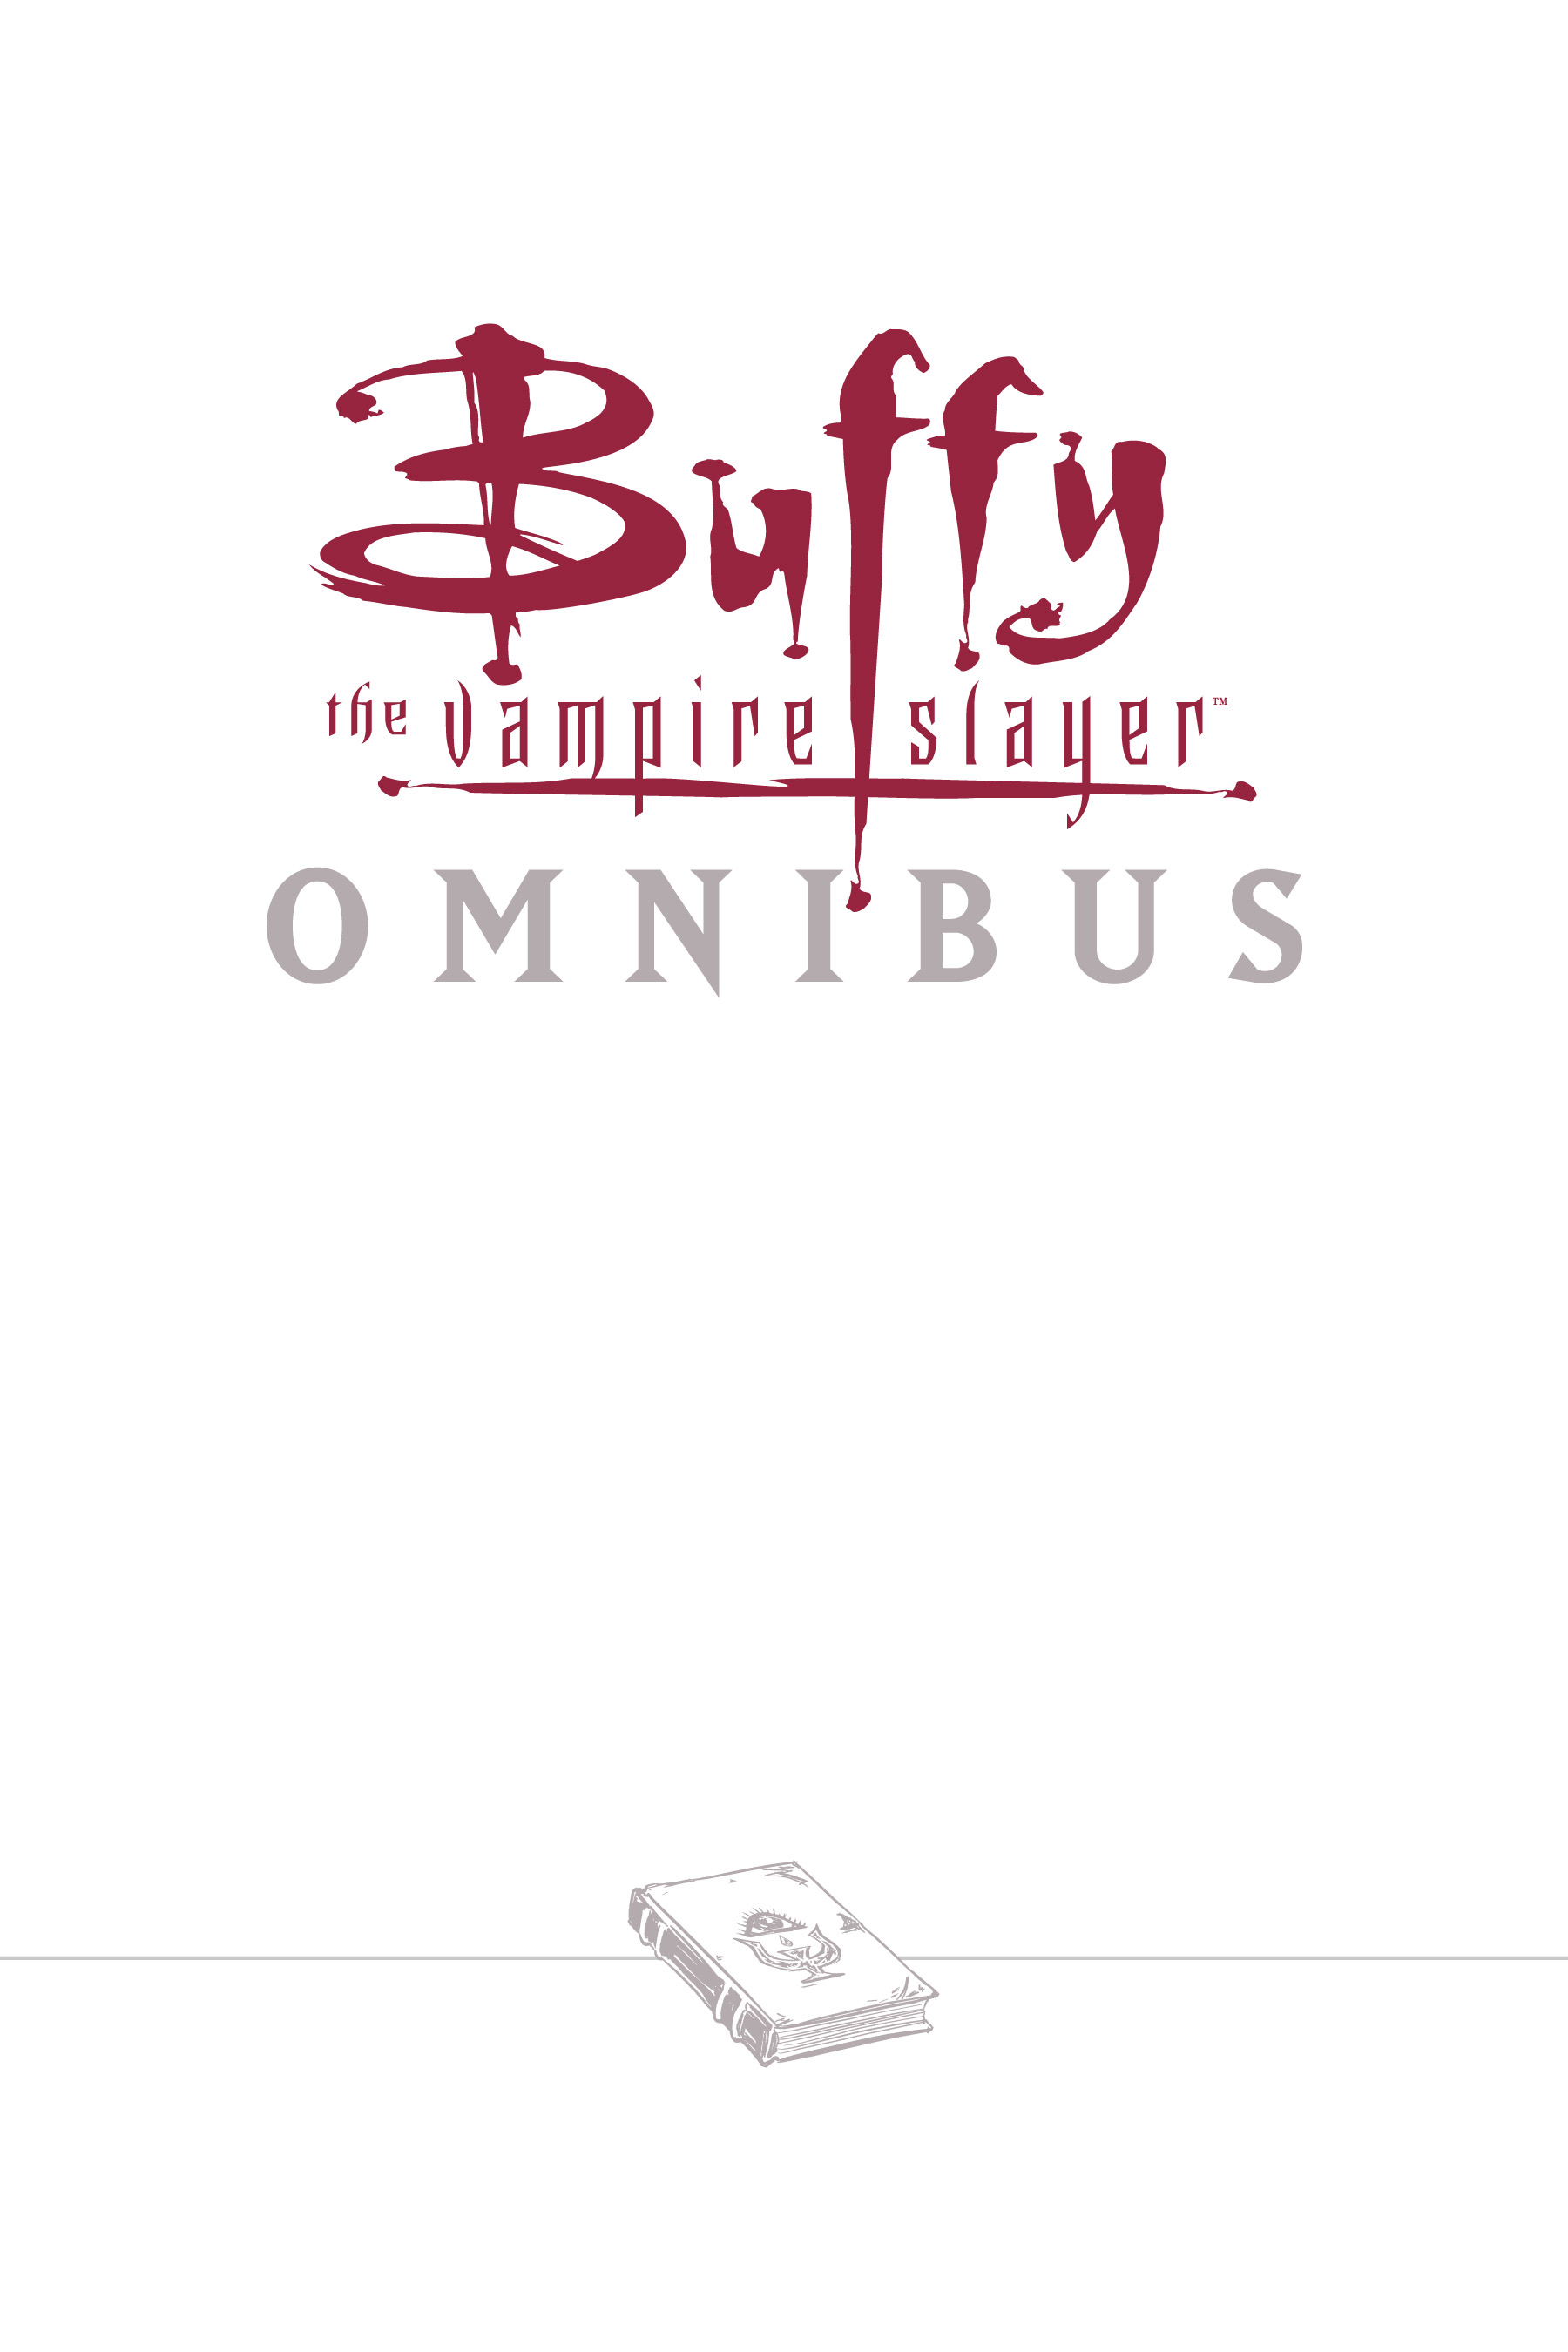 Read online Buffy the Vampire Slayer: Omnibus comic -  Issue # TPB 1 - 3